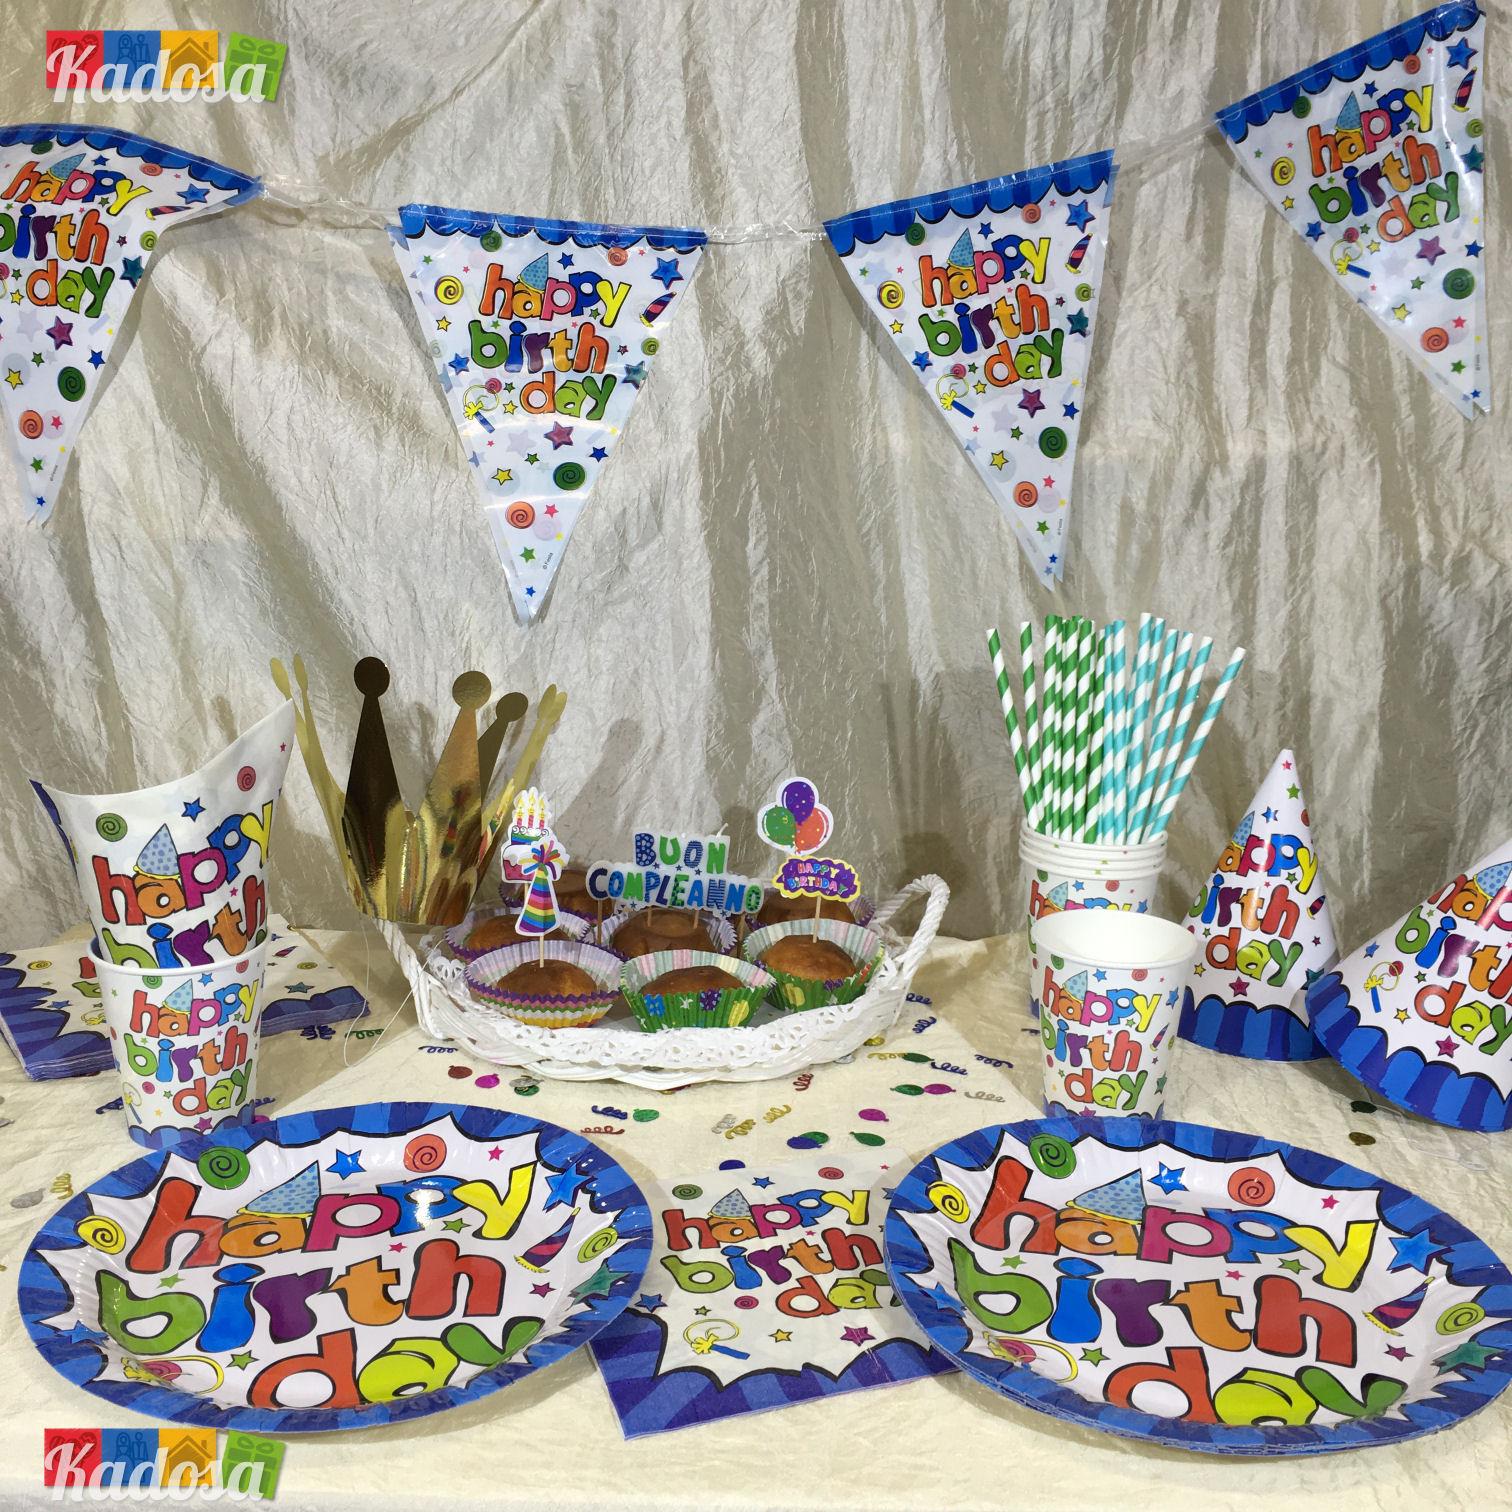 Set 6 Piatti Happy Birthday Compleanno Festa in scatola Birthday